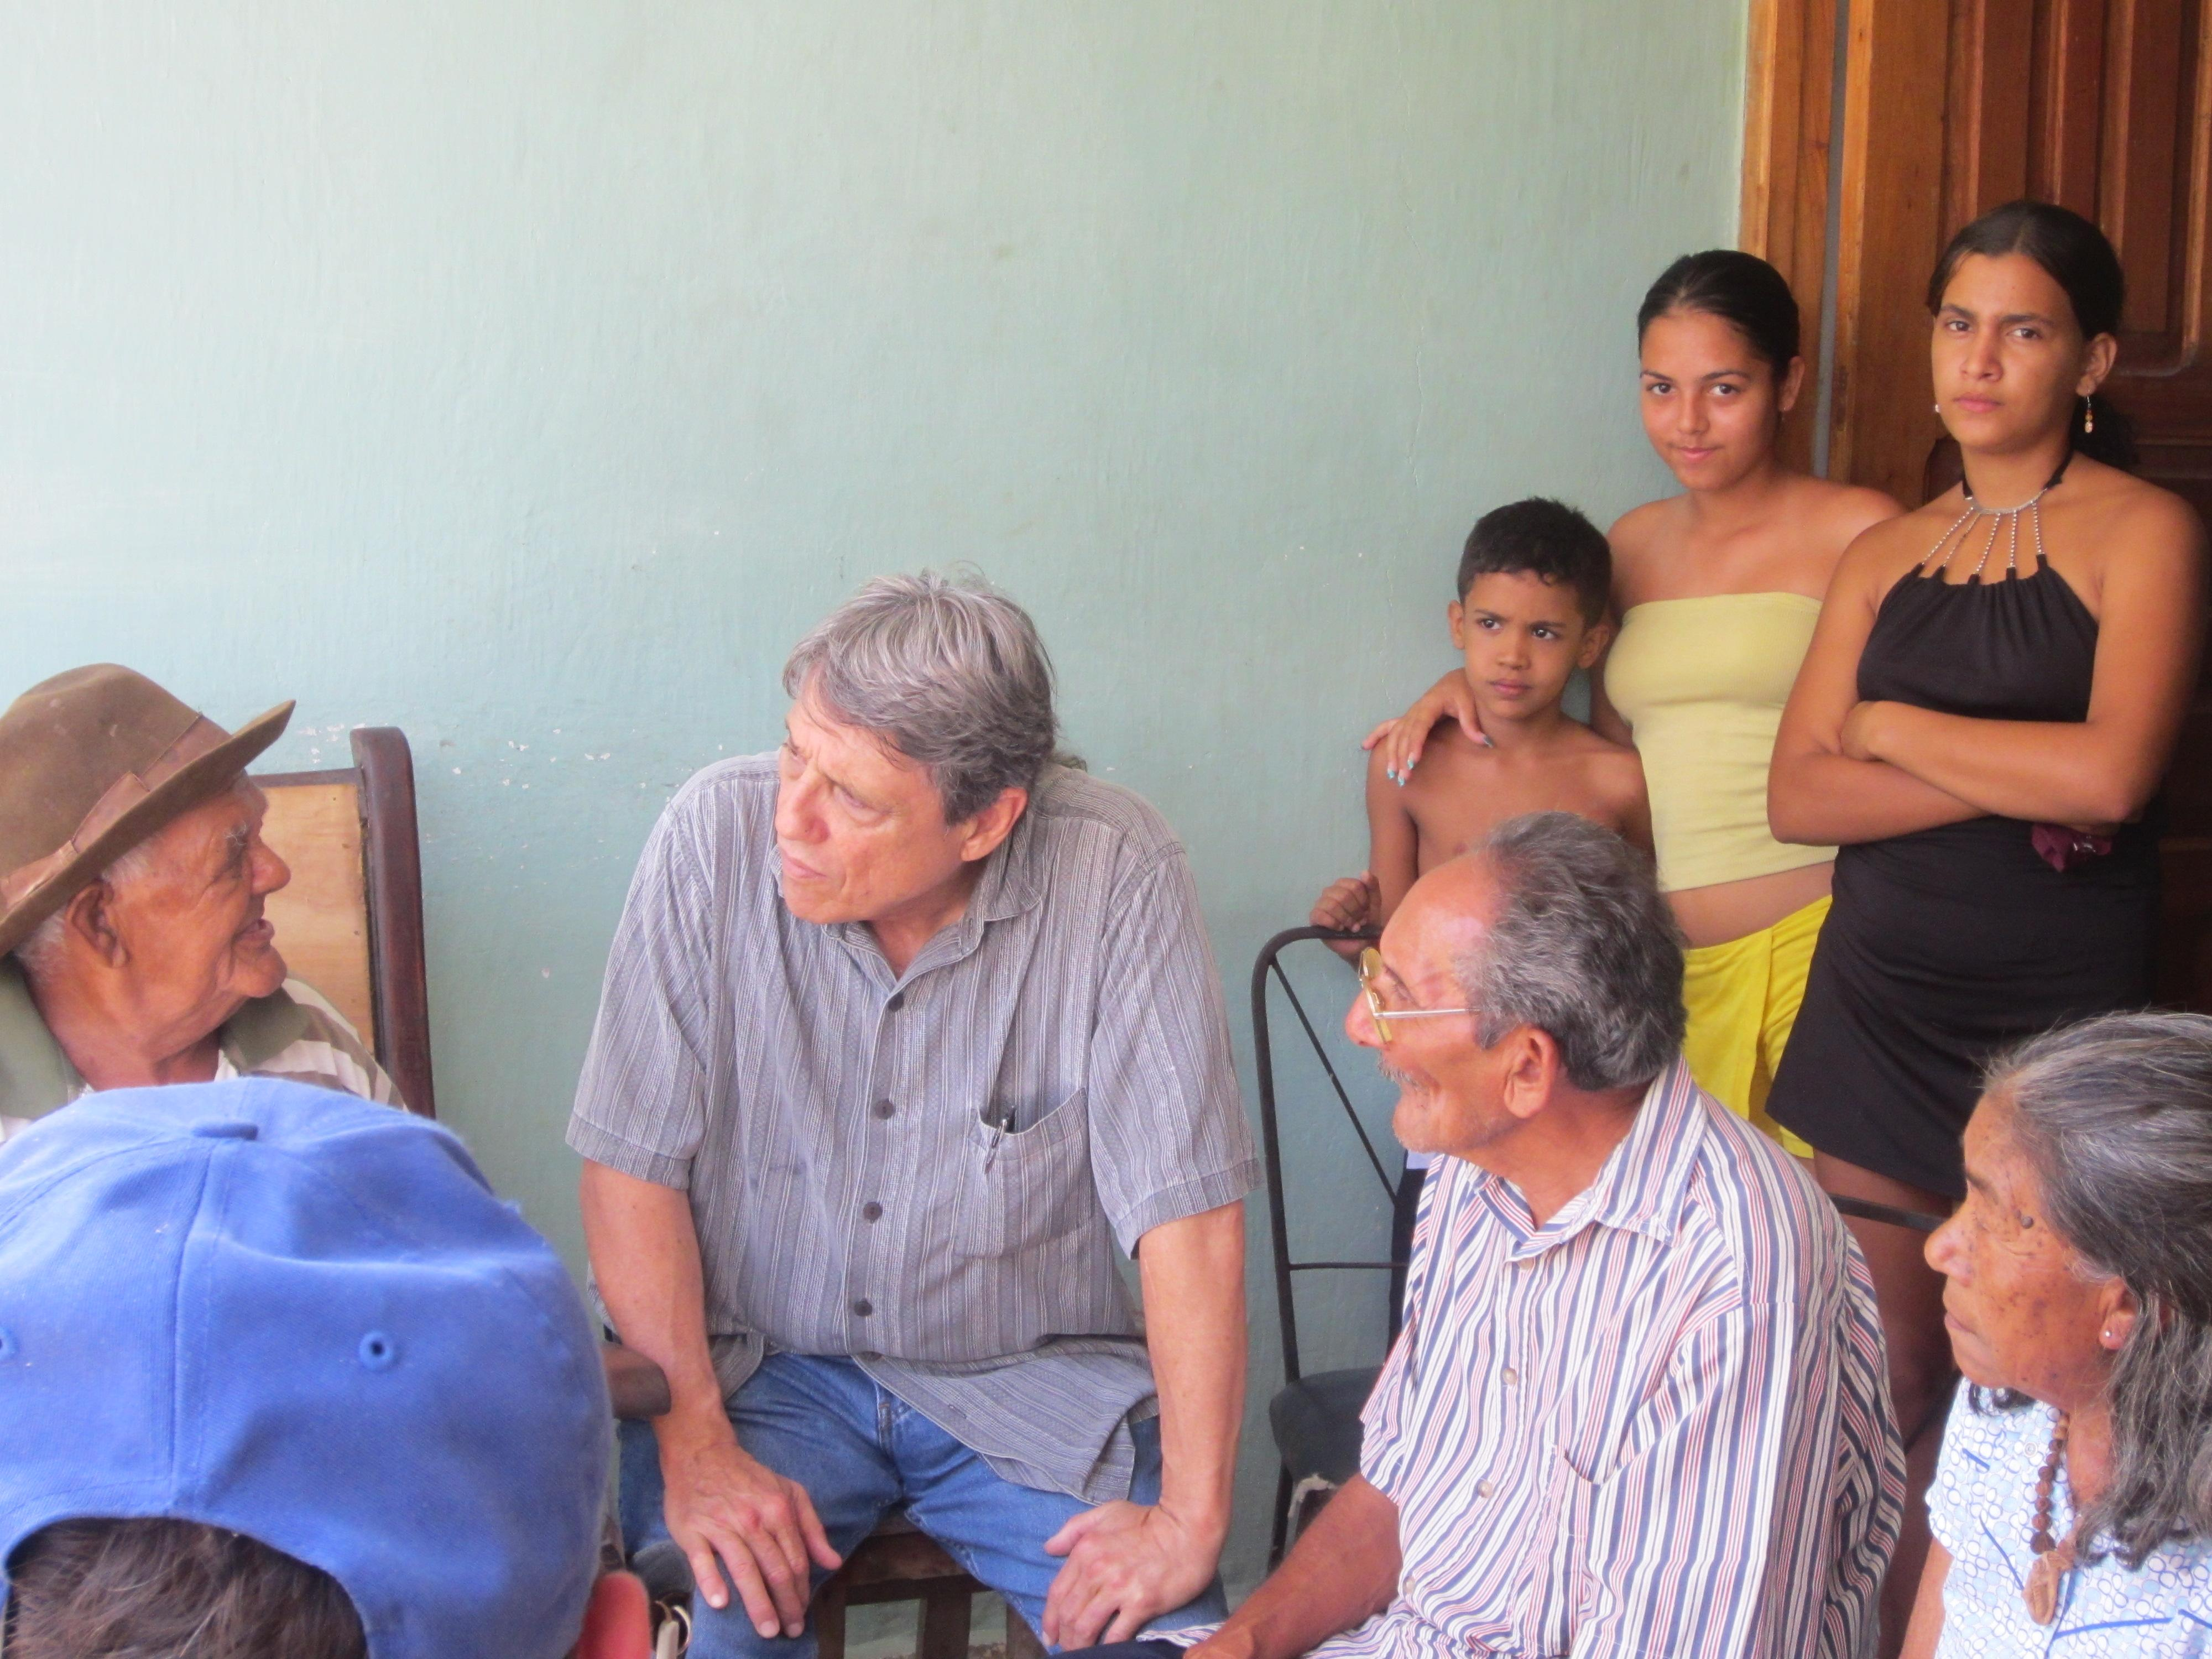 José Barreiro interviewing Cuban Indio curandero (healer), don Pedro Rufo Mengana, El Caney community, eastern Cuba. Credit: Alejandro Hartmann.